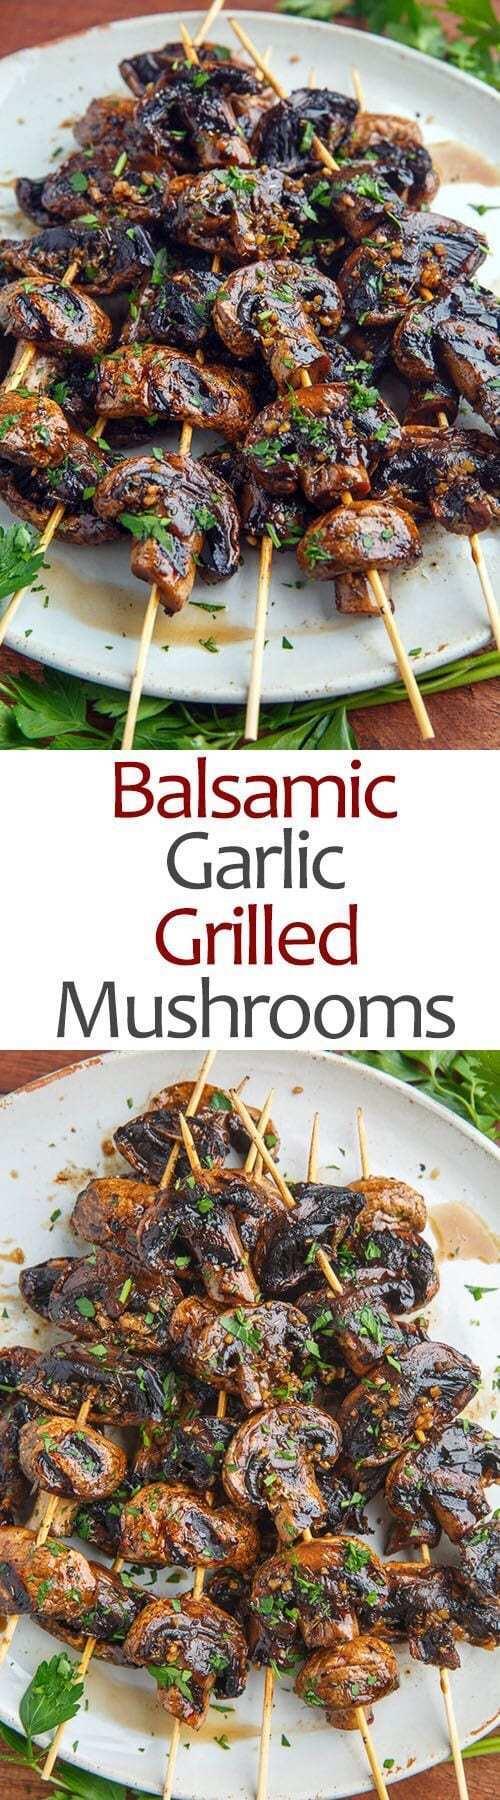 Balsamic Garlic Grilled Mushrooms